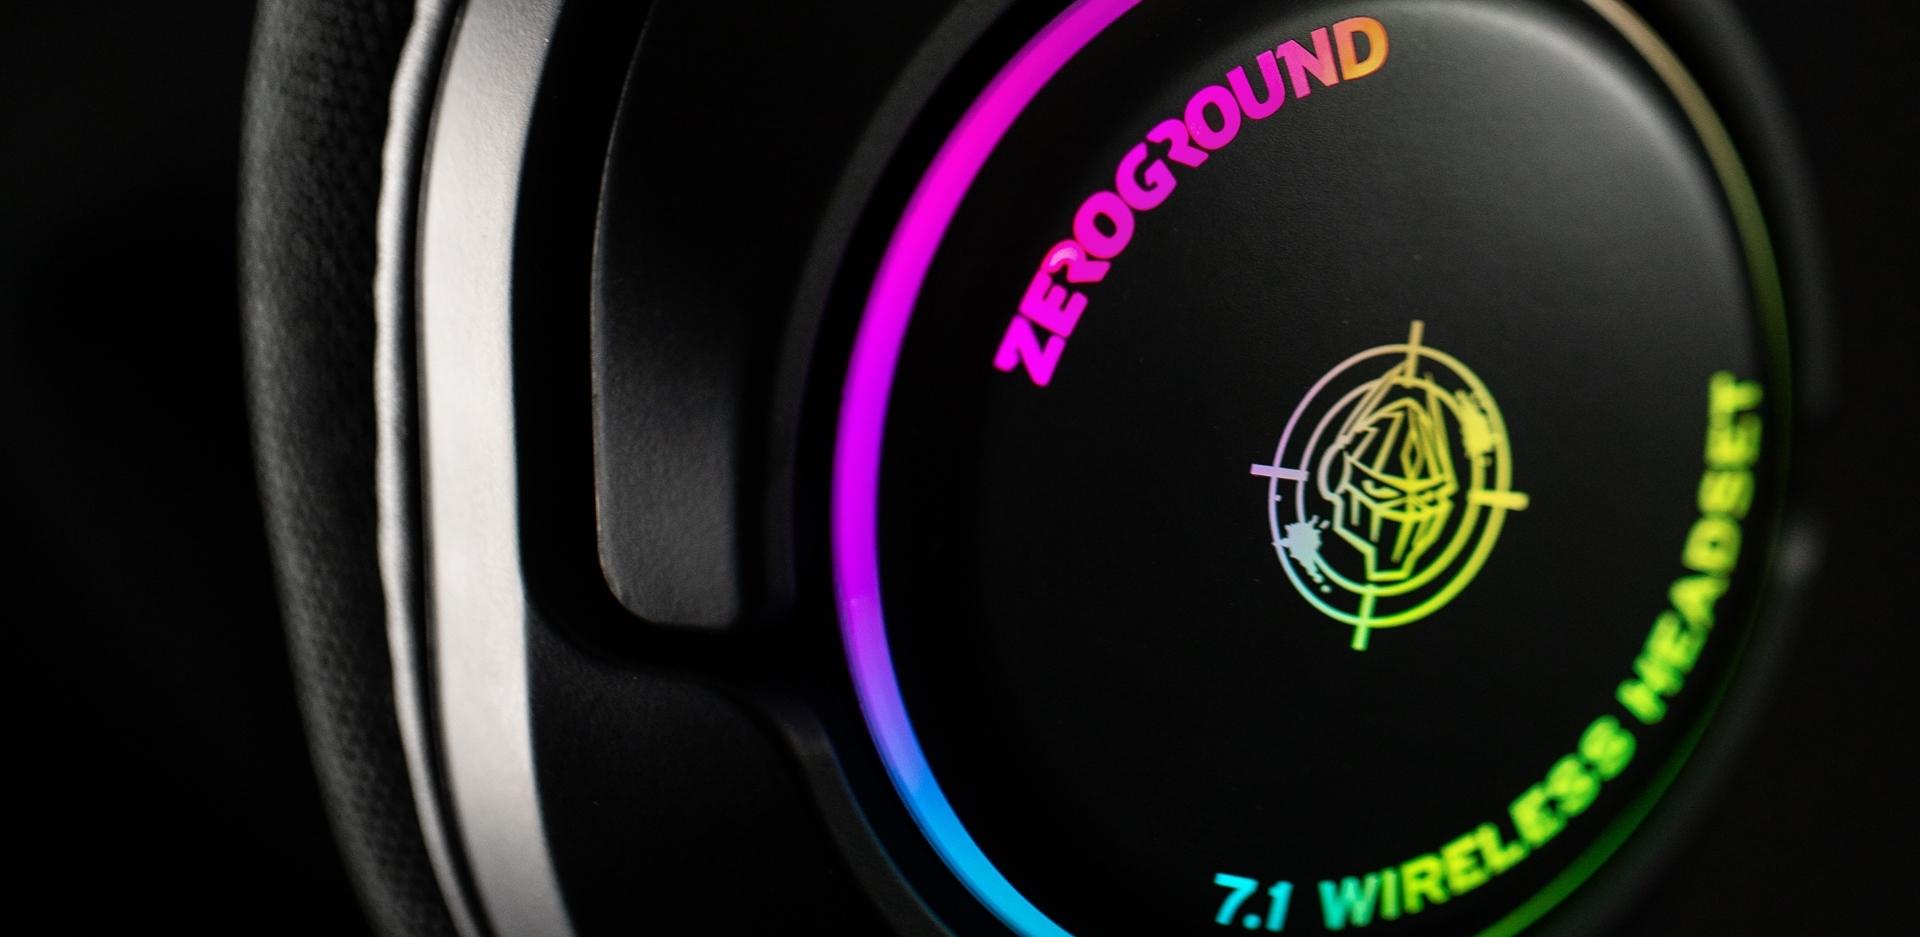 ZeroGround Akashi - Gaming headset